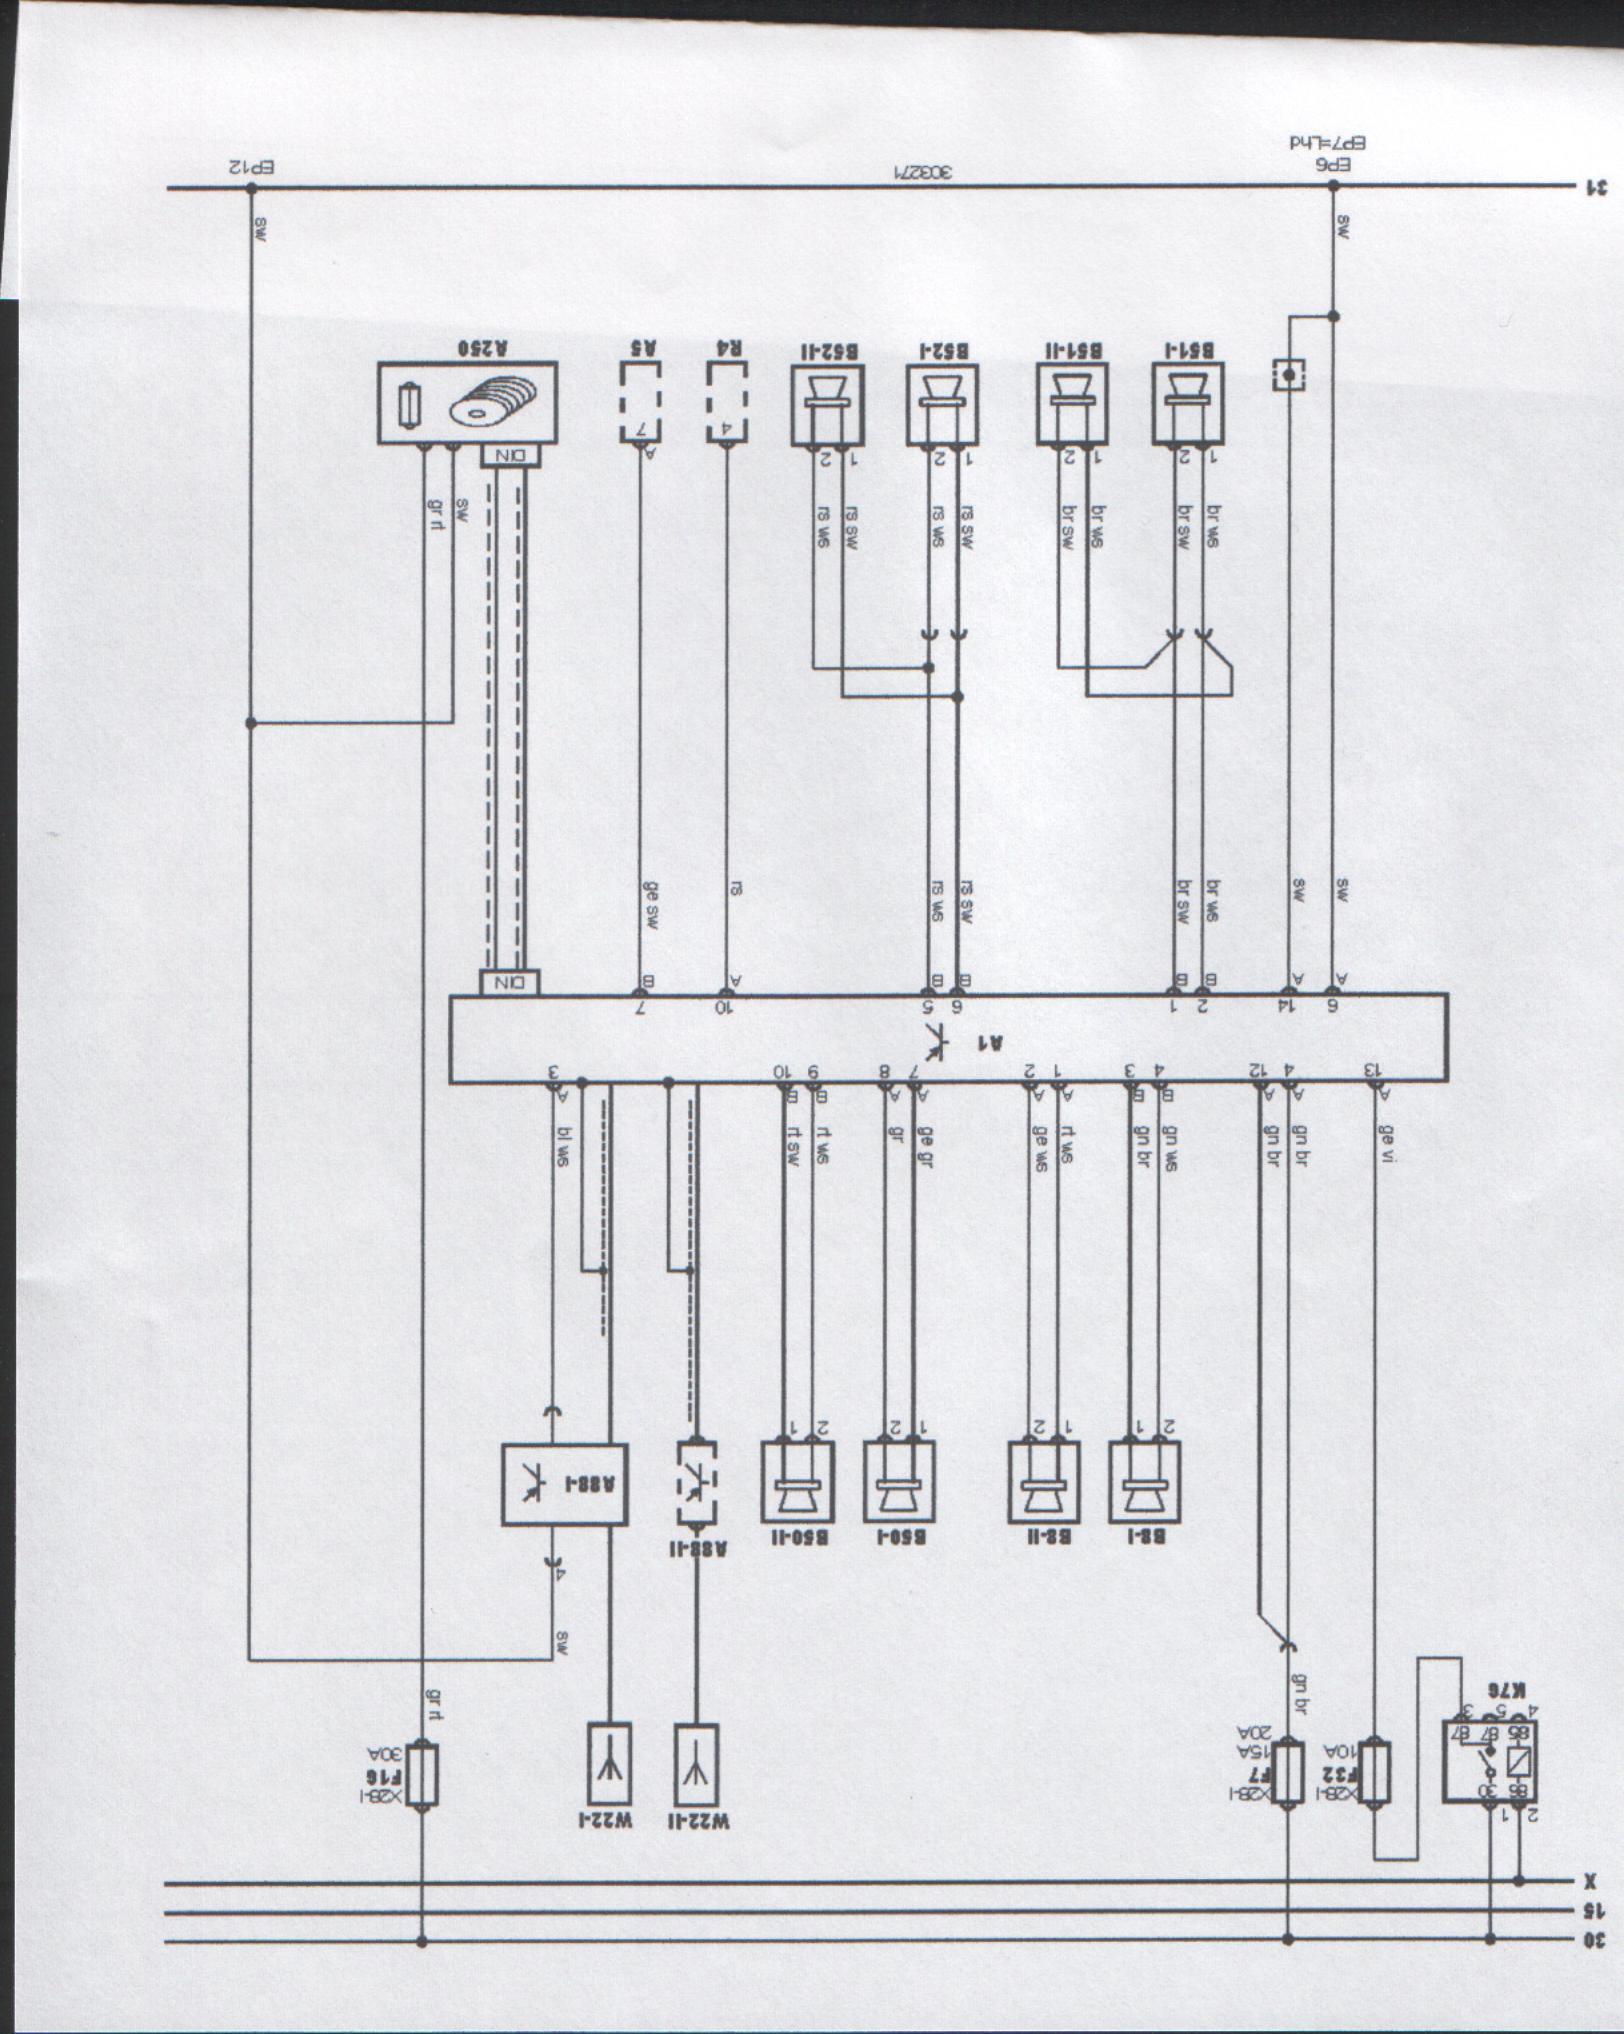 Diagram Bobcat S70 Wiring Diagram Full Version Hd Quality Wiring Diagram Diagramrapkeu Apd Audax It